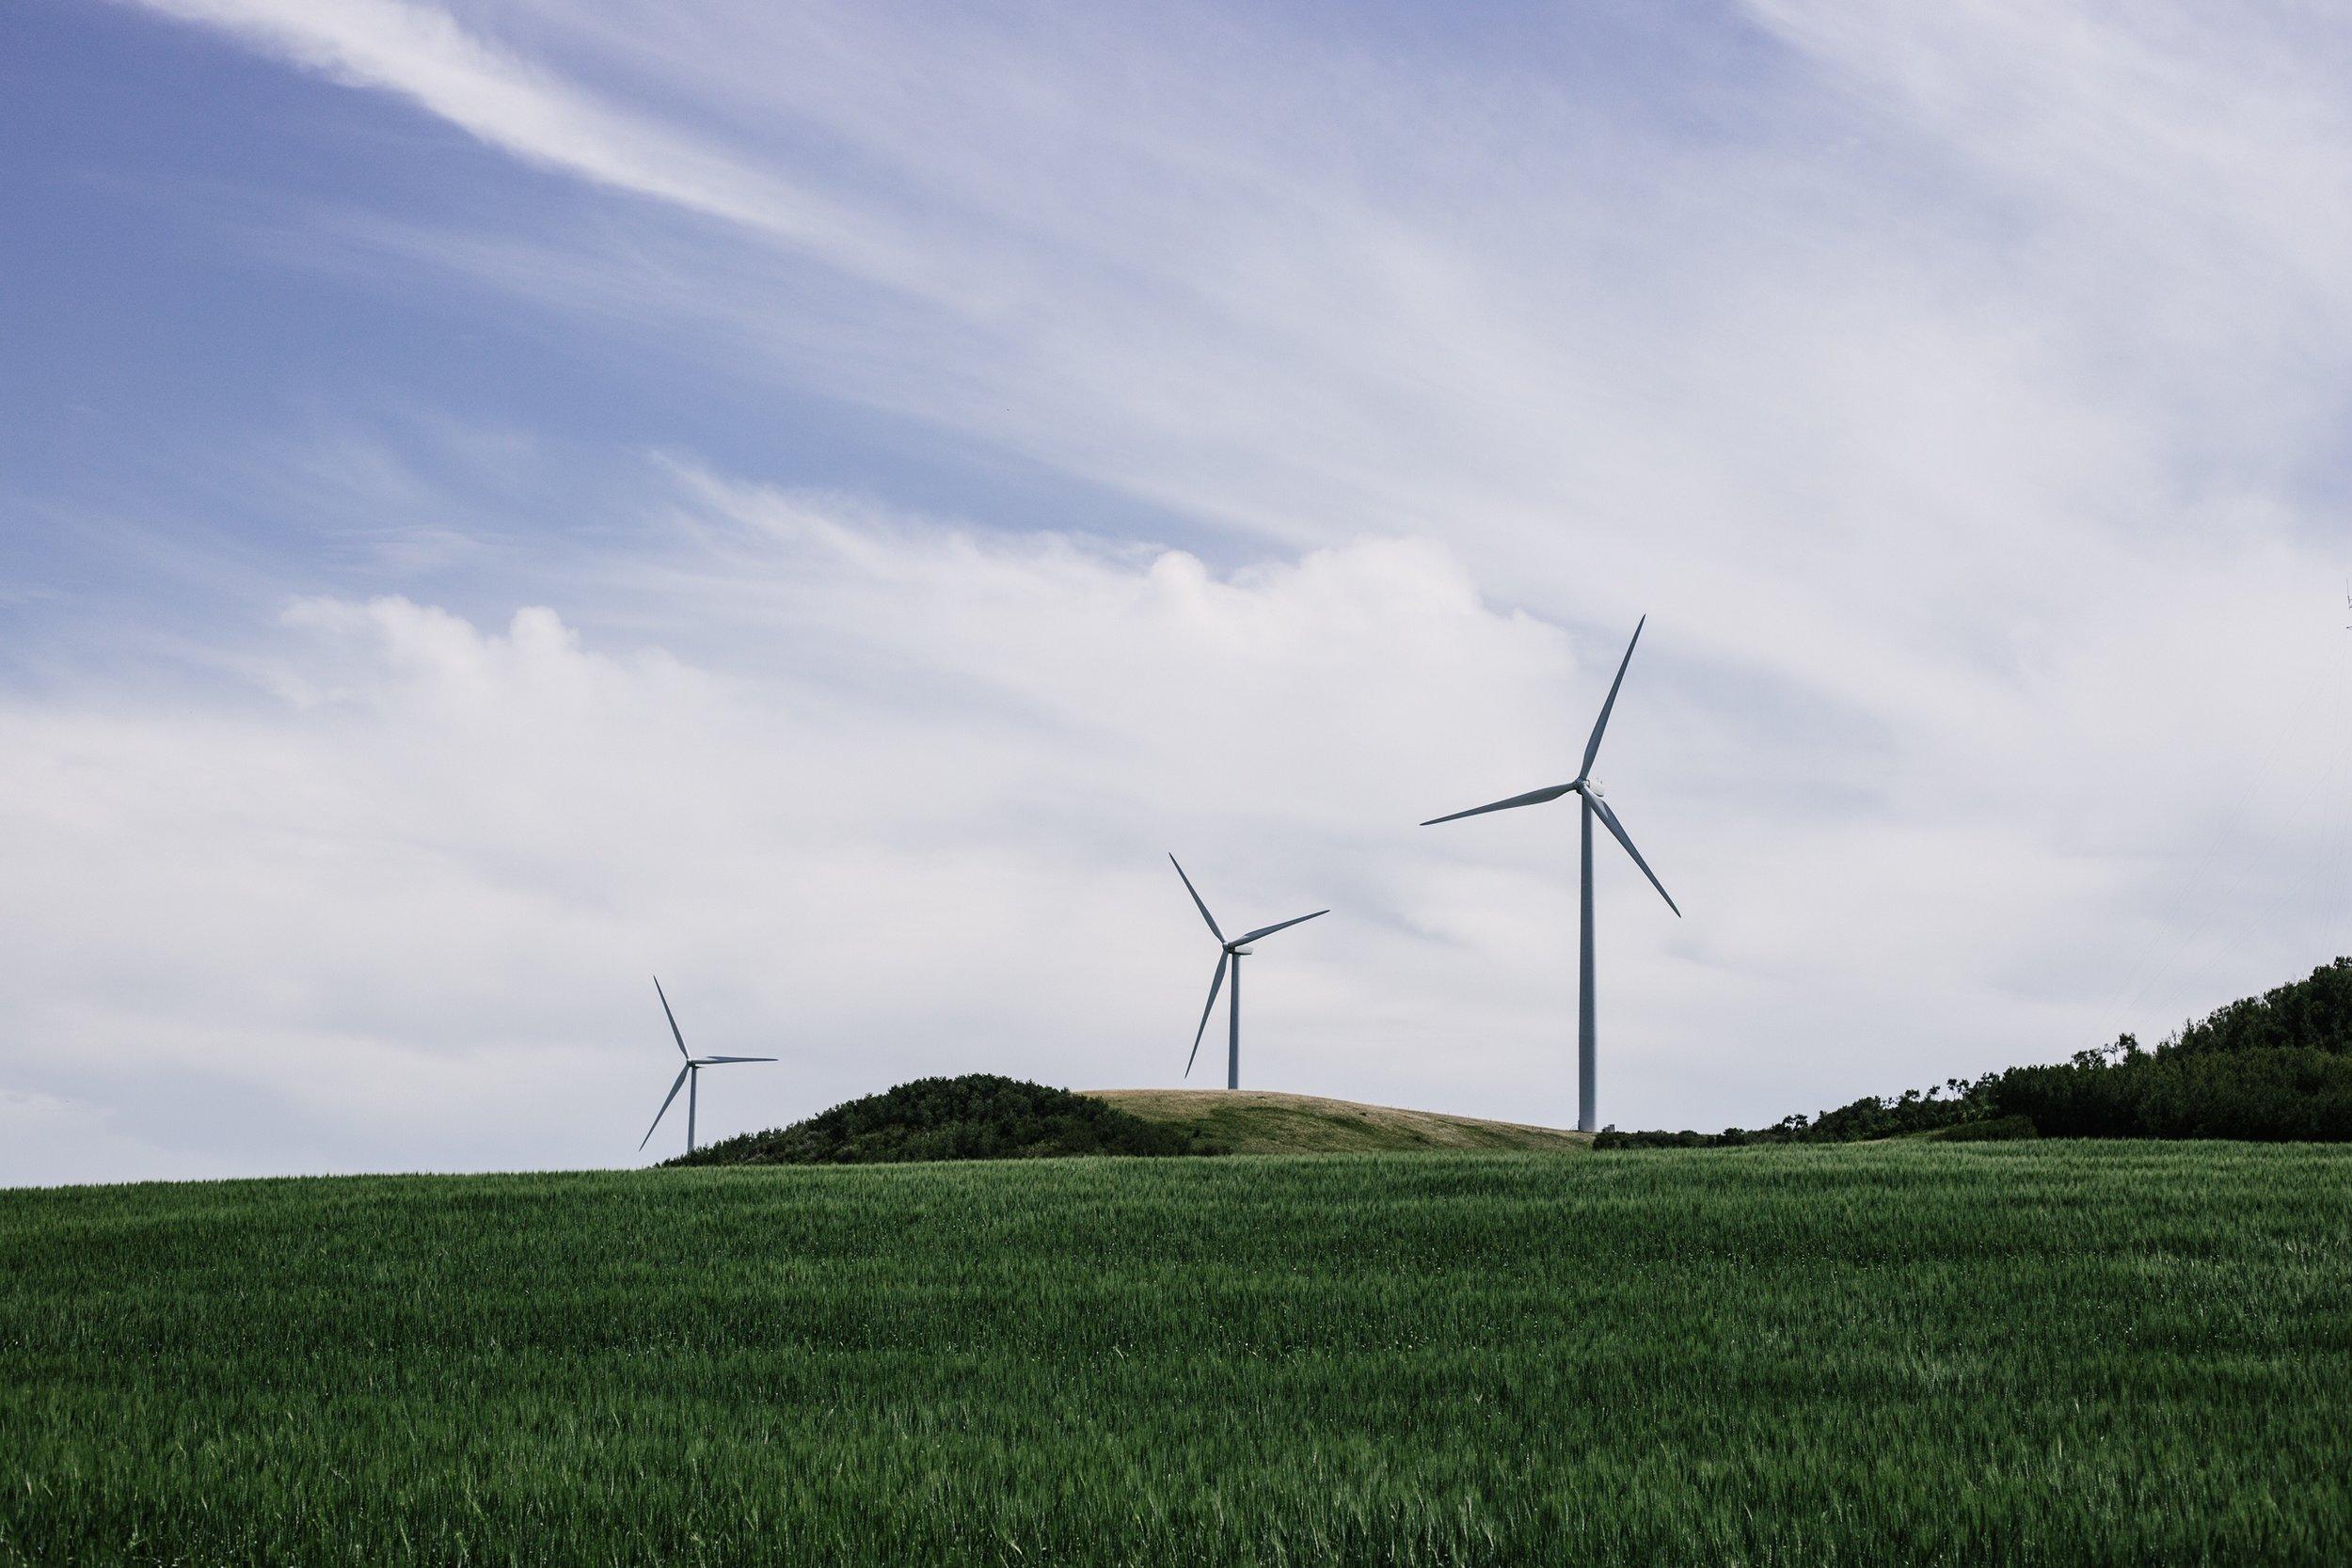 - Landowner Shares What It's Like to Host an Avangrid Renewables Wind Turbine